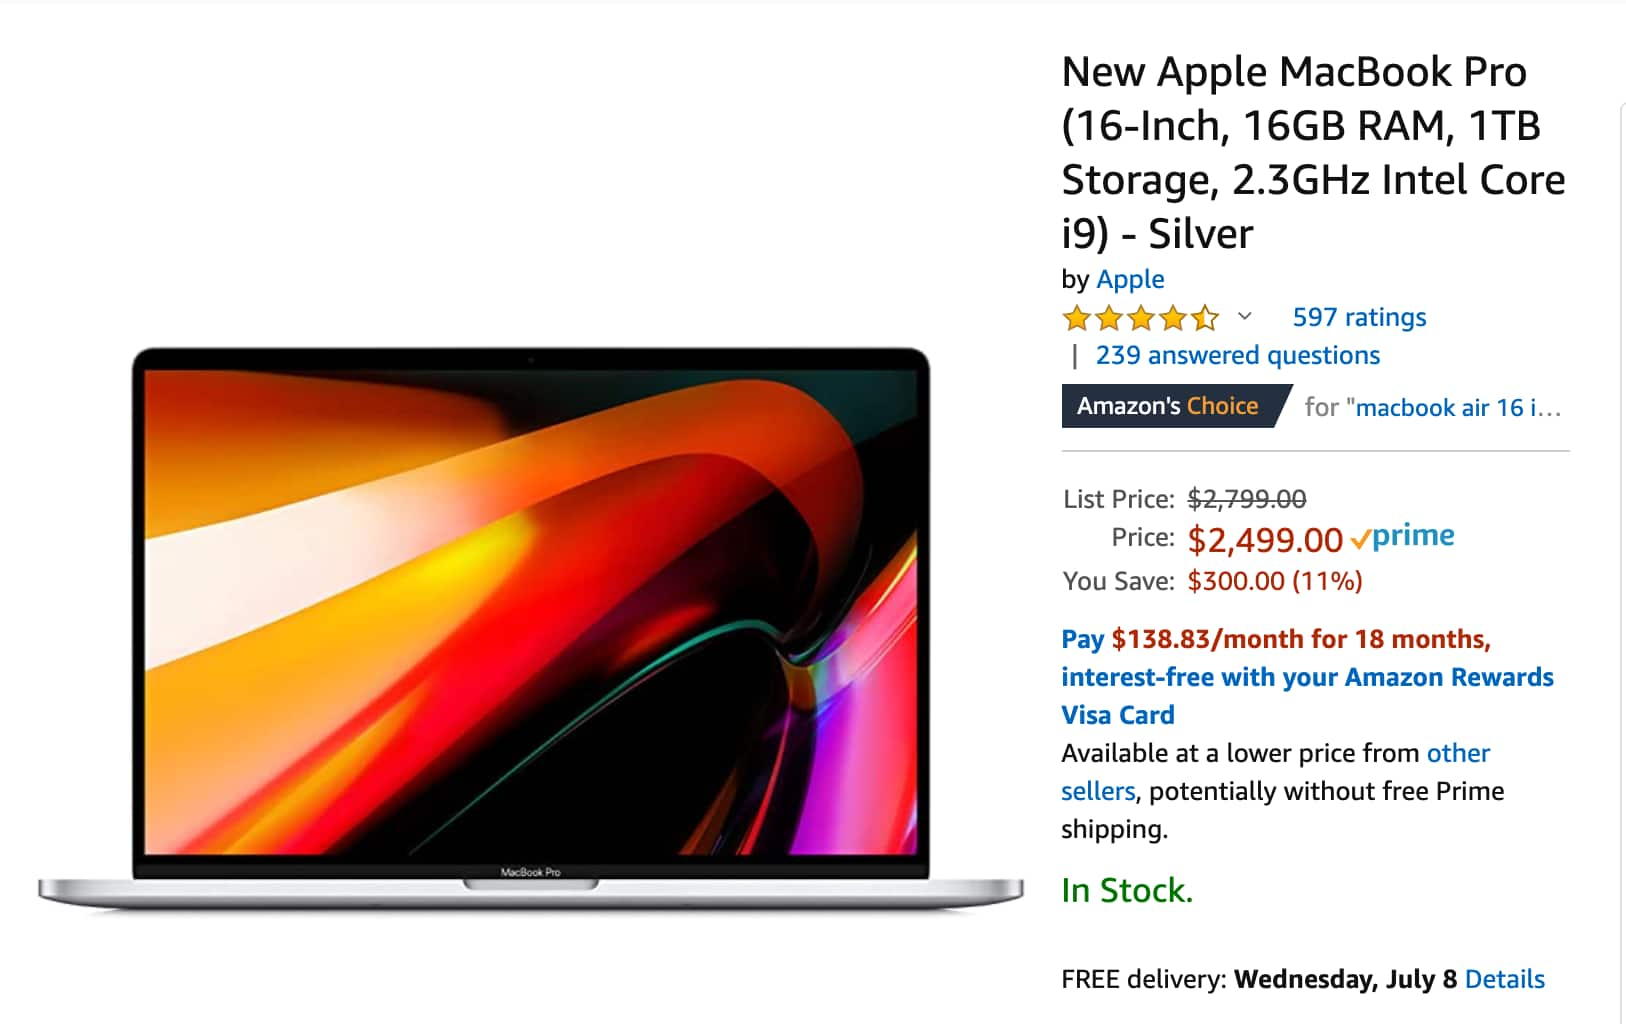 Apple MacBook Pro 16-Inch - 16GB RAM -1TB Storage - 2.3GHz Intel Core i9 - Silver $2499 AMAZON